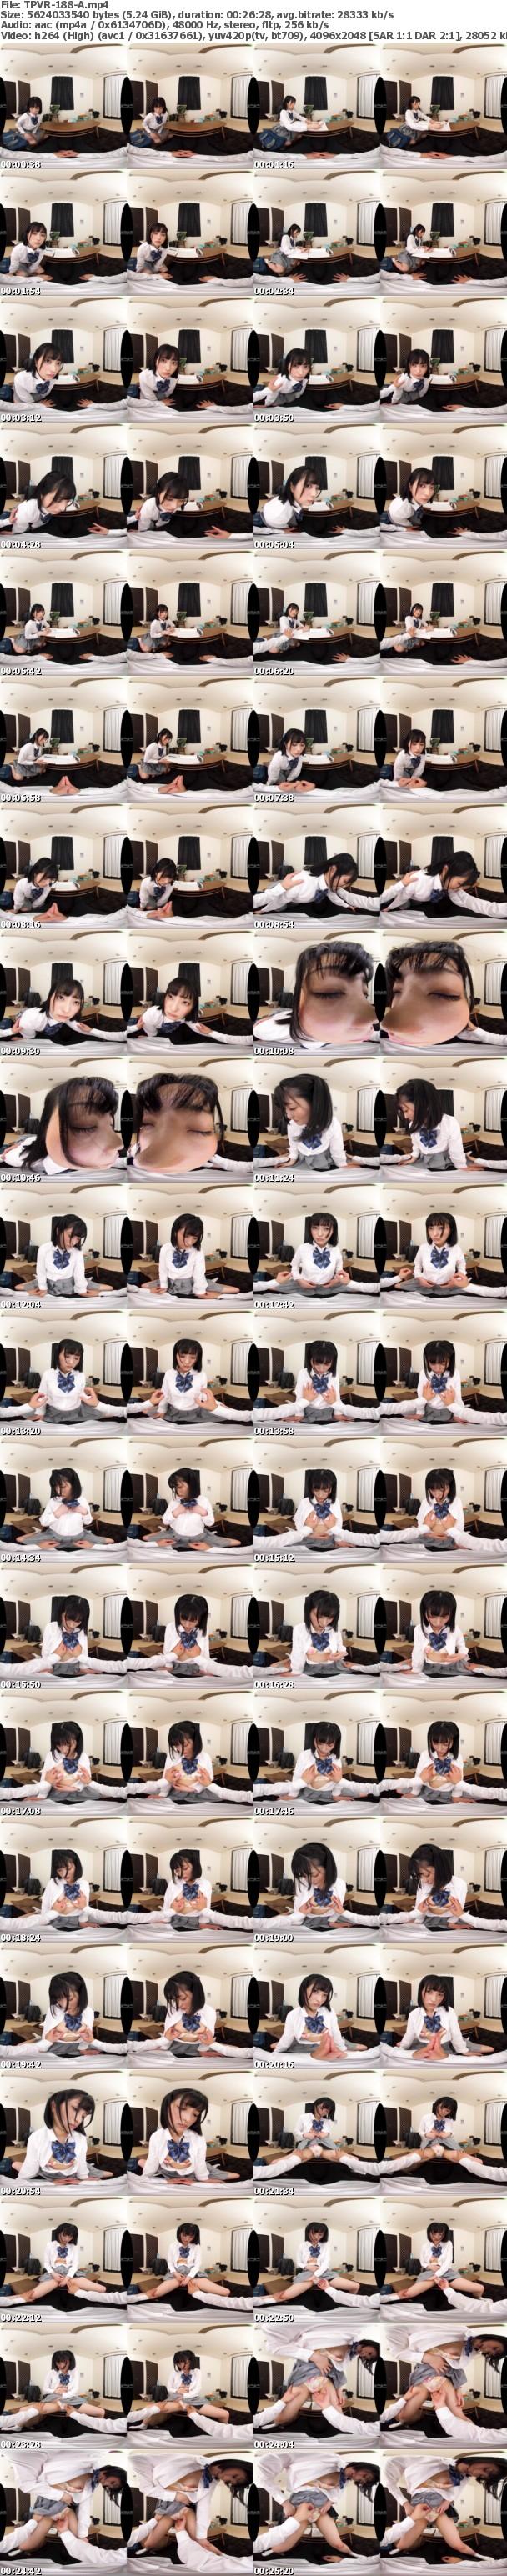 (VR) TPVR-188 HQ60fps 「え、彼女ができたの!?」 J●幼馴染の嫉妬と愛情が交差する青春SEX